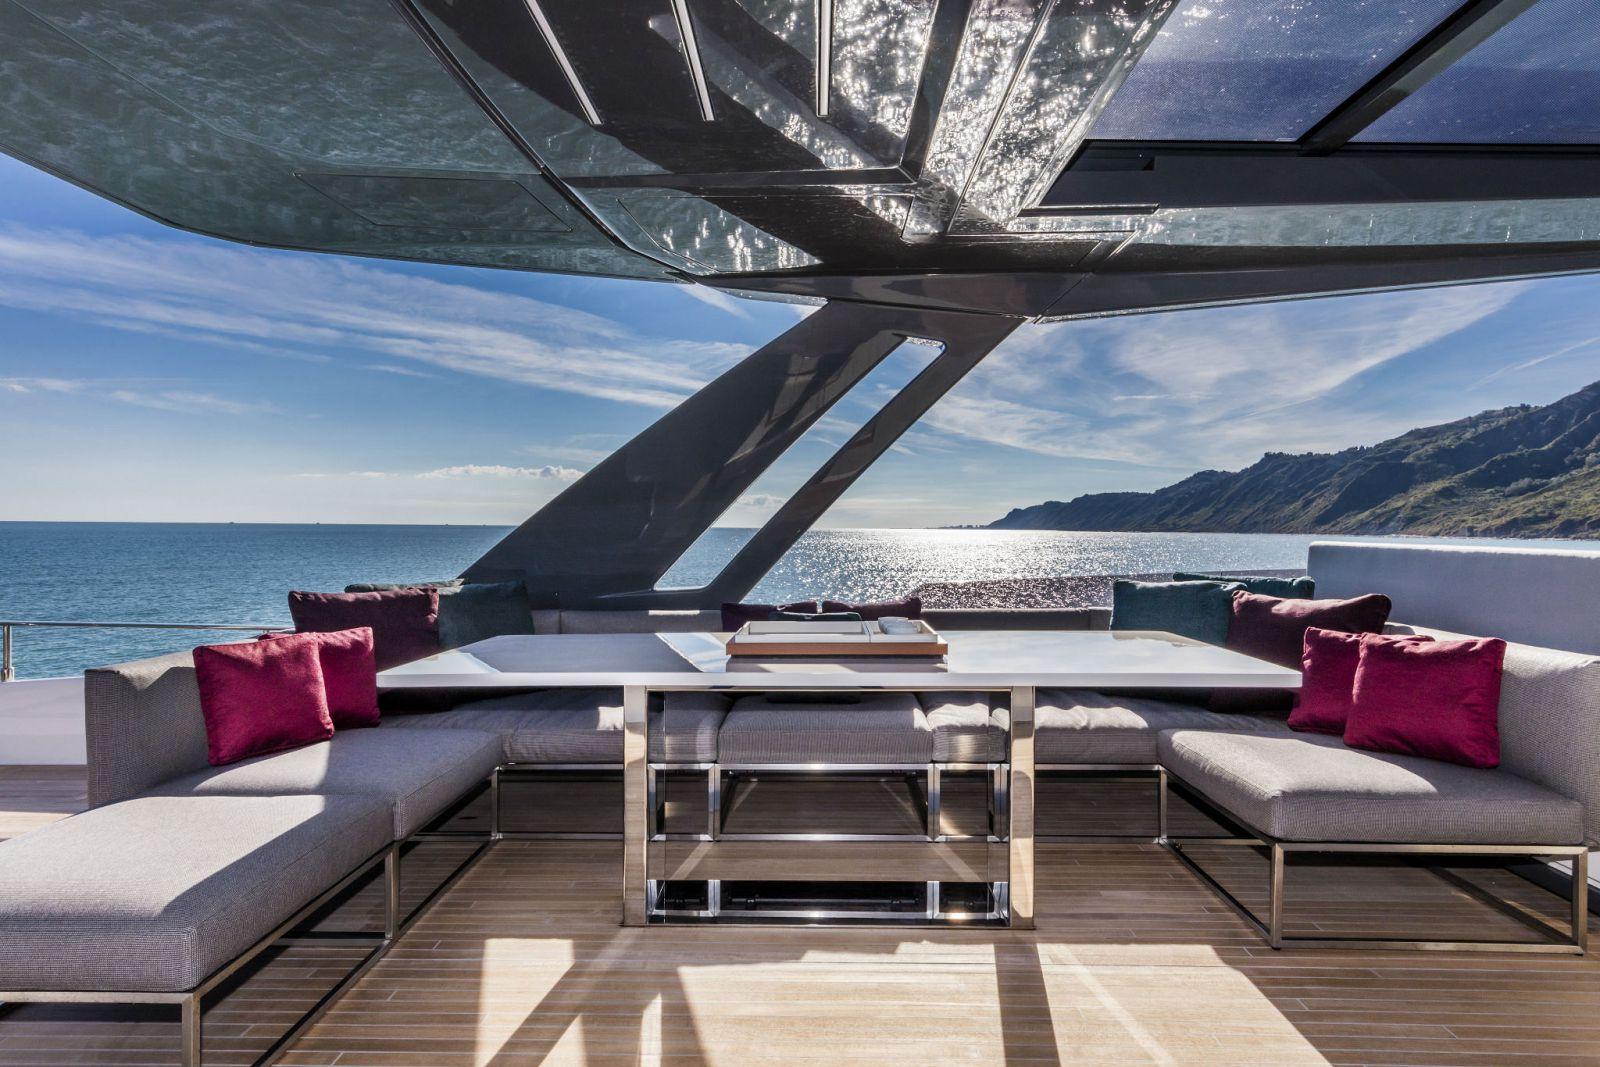 Ferretti Yachts 850 Flybridge - New Luxury Yacht for Sale >